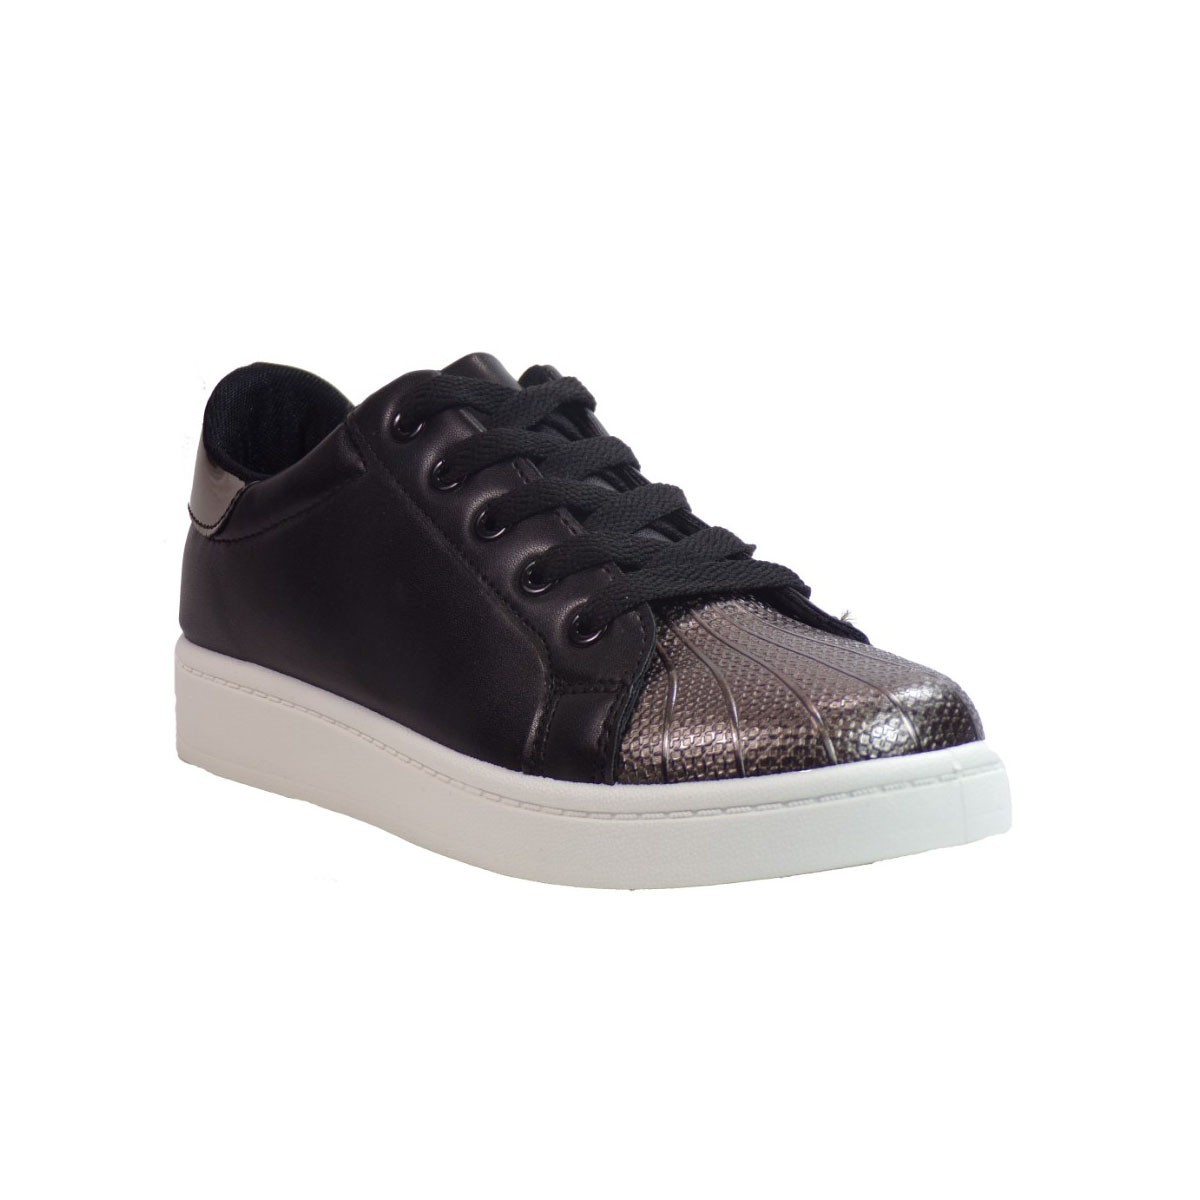 Bagiota shoes Sneakers Παπούτσια Γυναικεία W-128 Μαύρο Bagiota shoes W-128 M